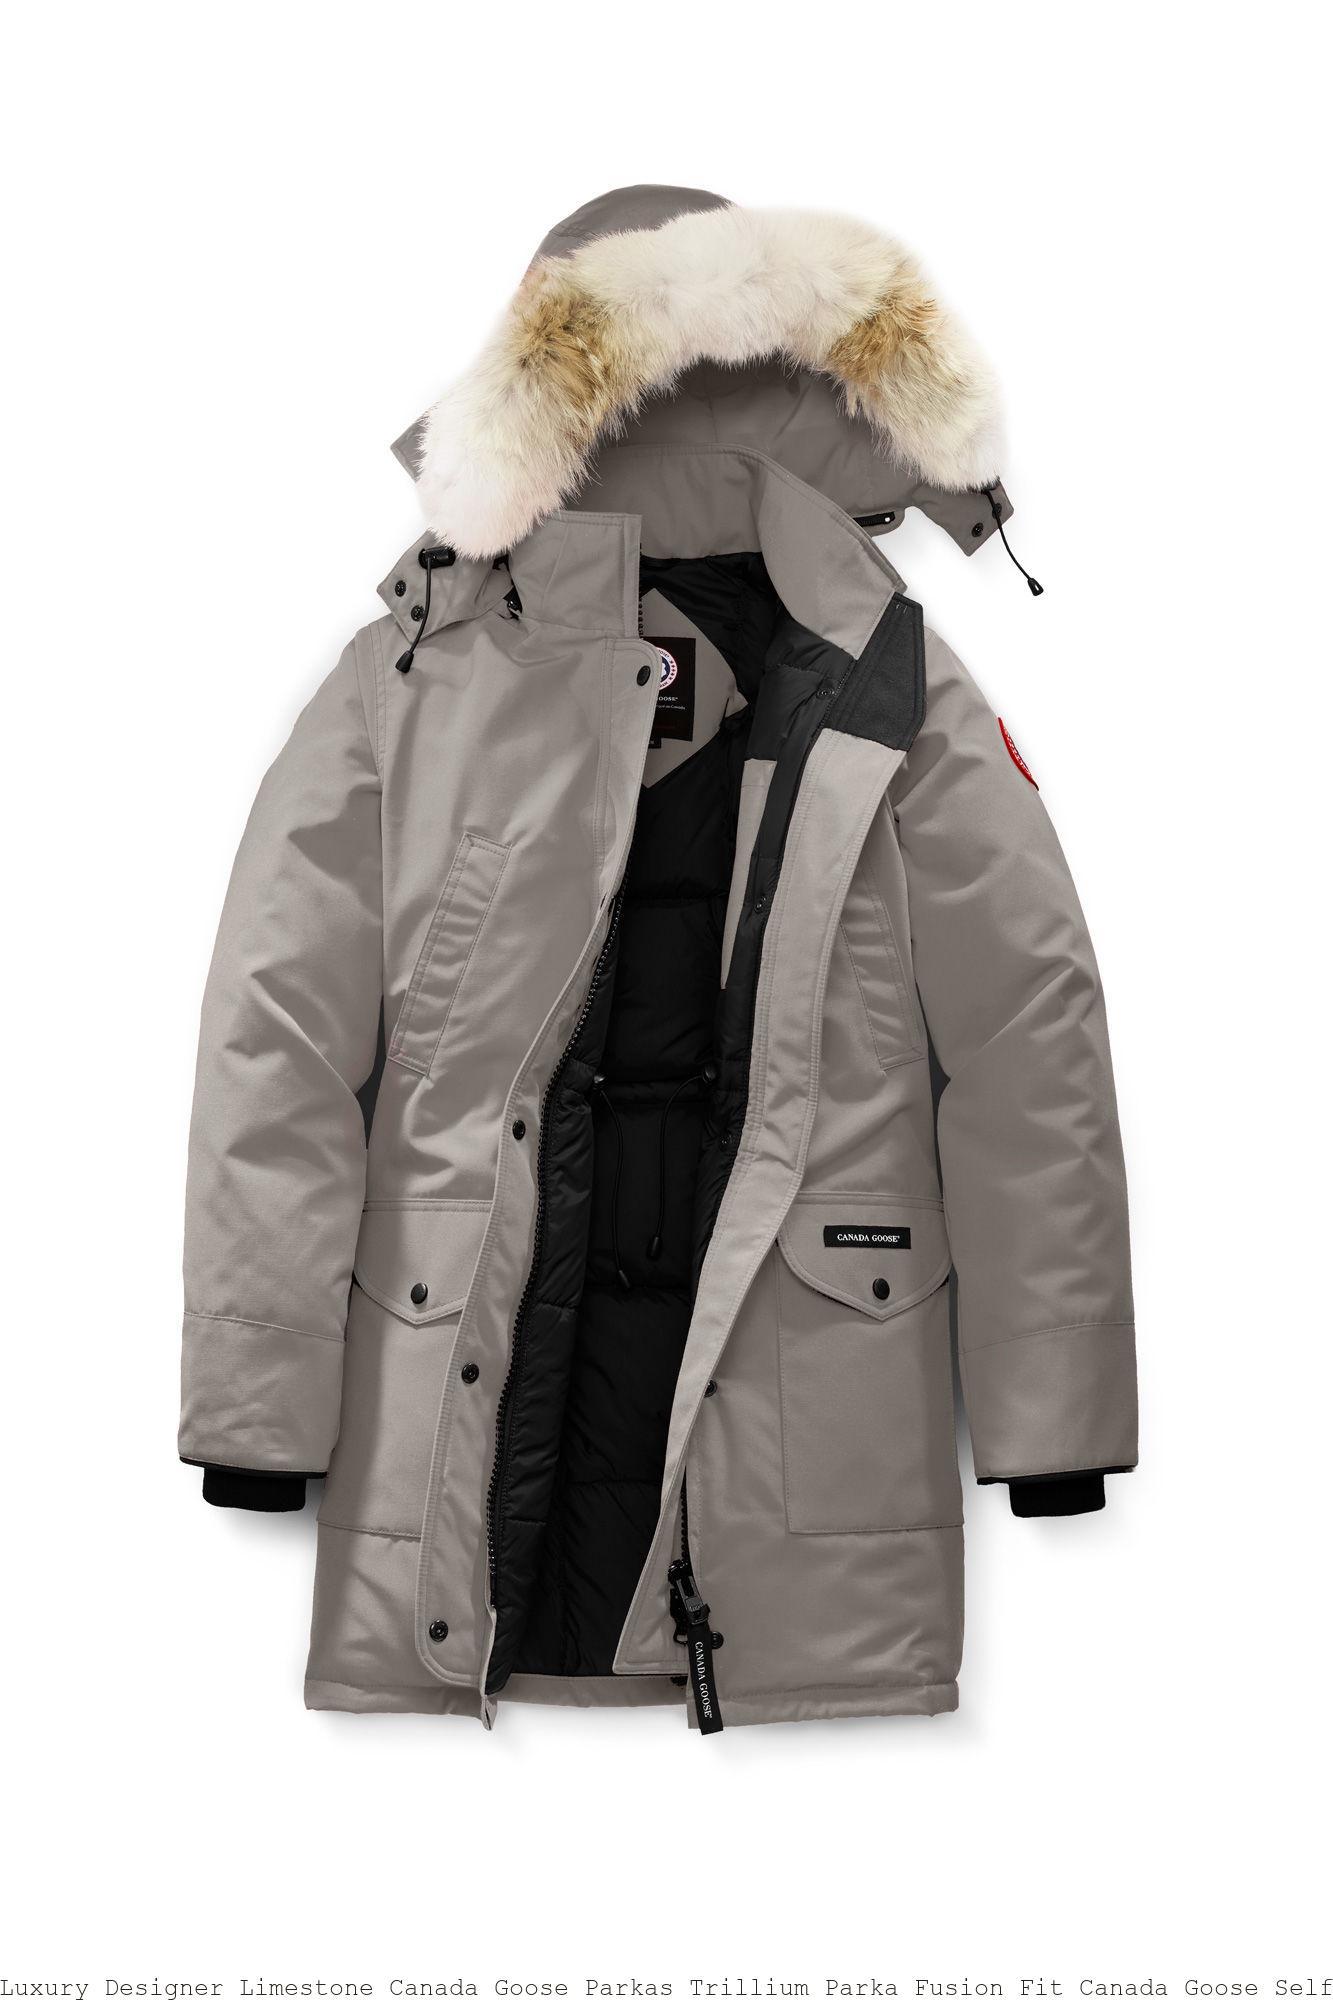 3579727fa82 Luxury Designer Limestone Canada Goose Parkas Trillium Parka Fusion Fit  Canada Goose Selfridges Uk 6660LA